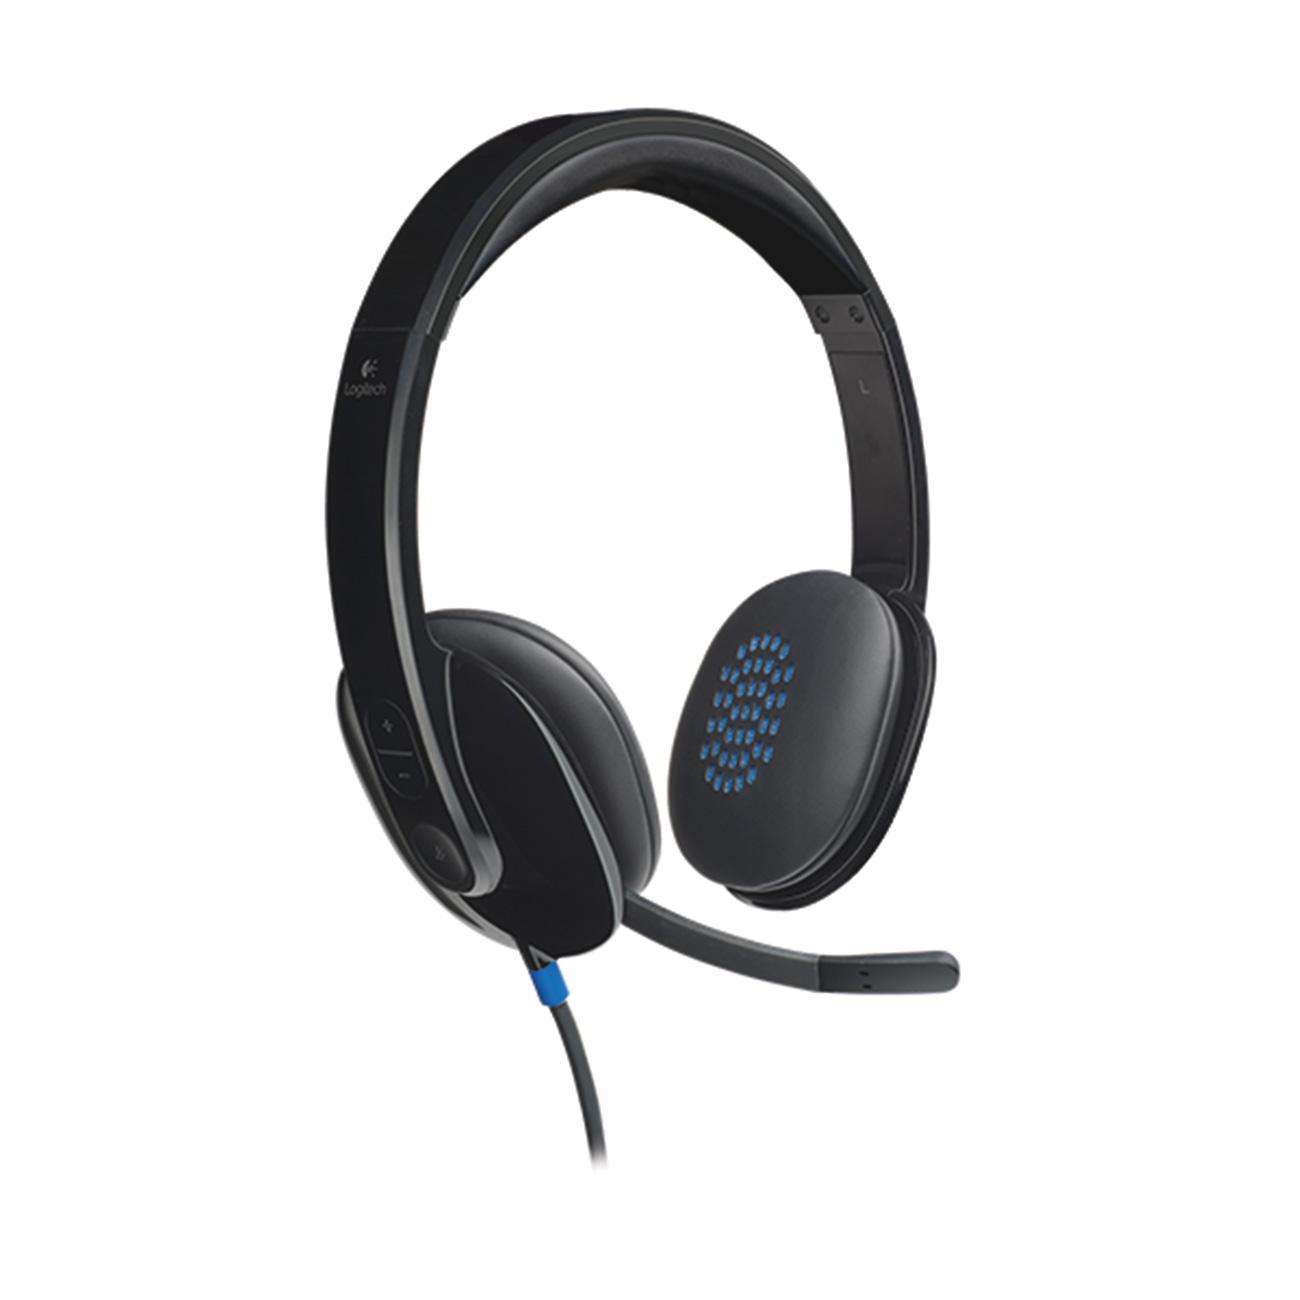 Logitech, LOG981000510, H540 USB Headset, 1, Black